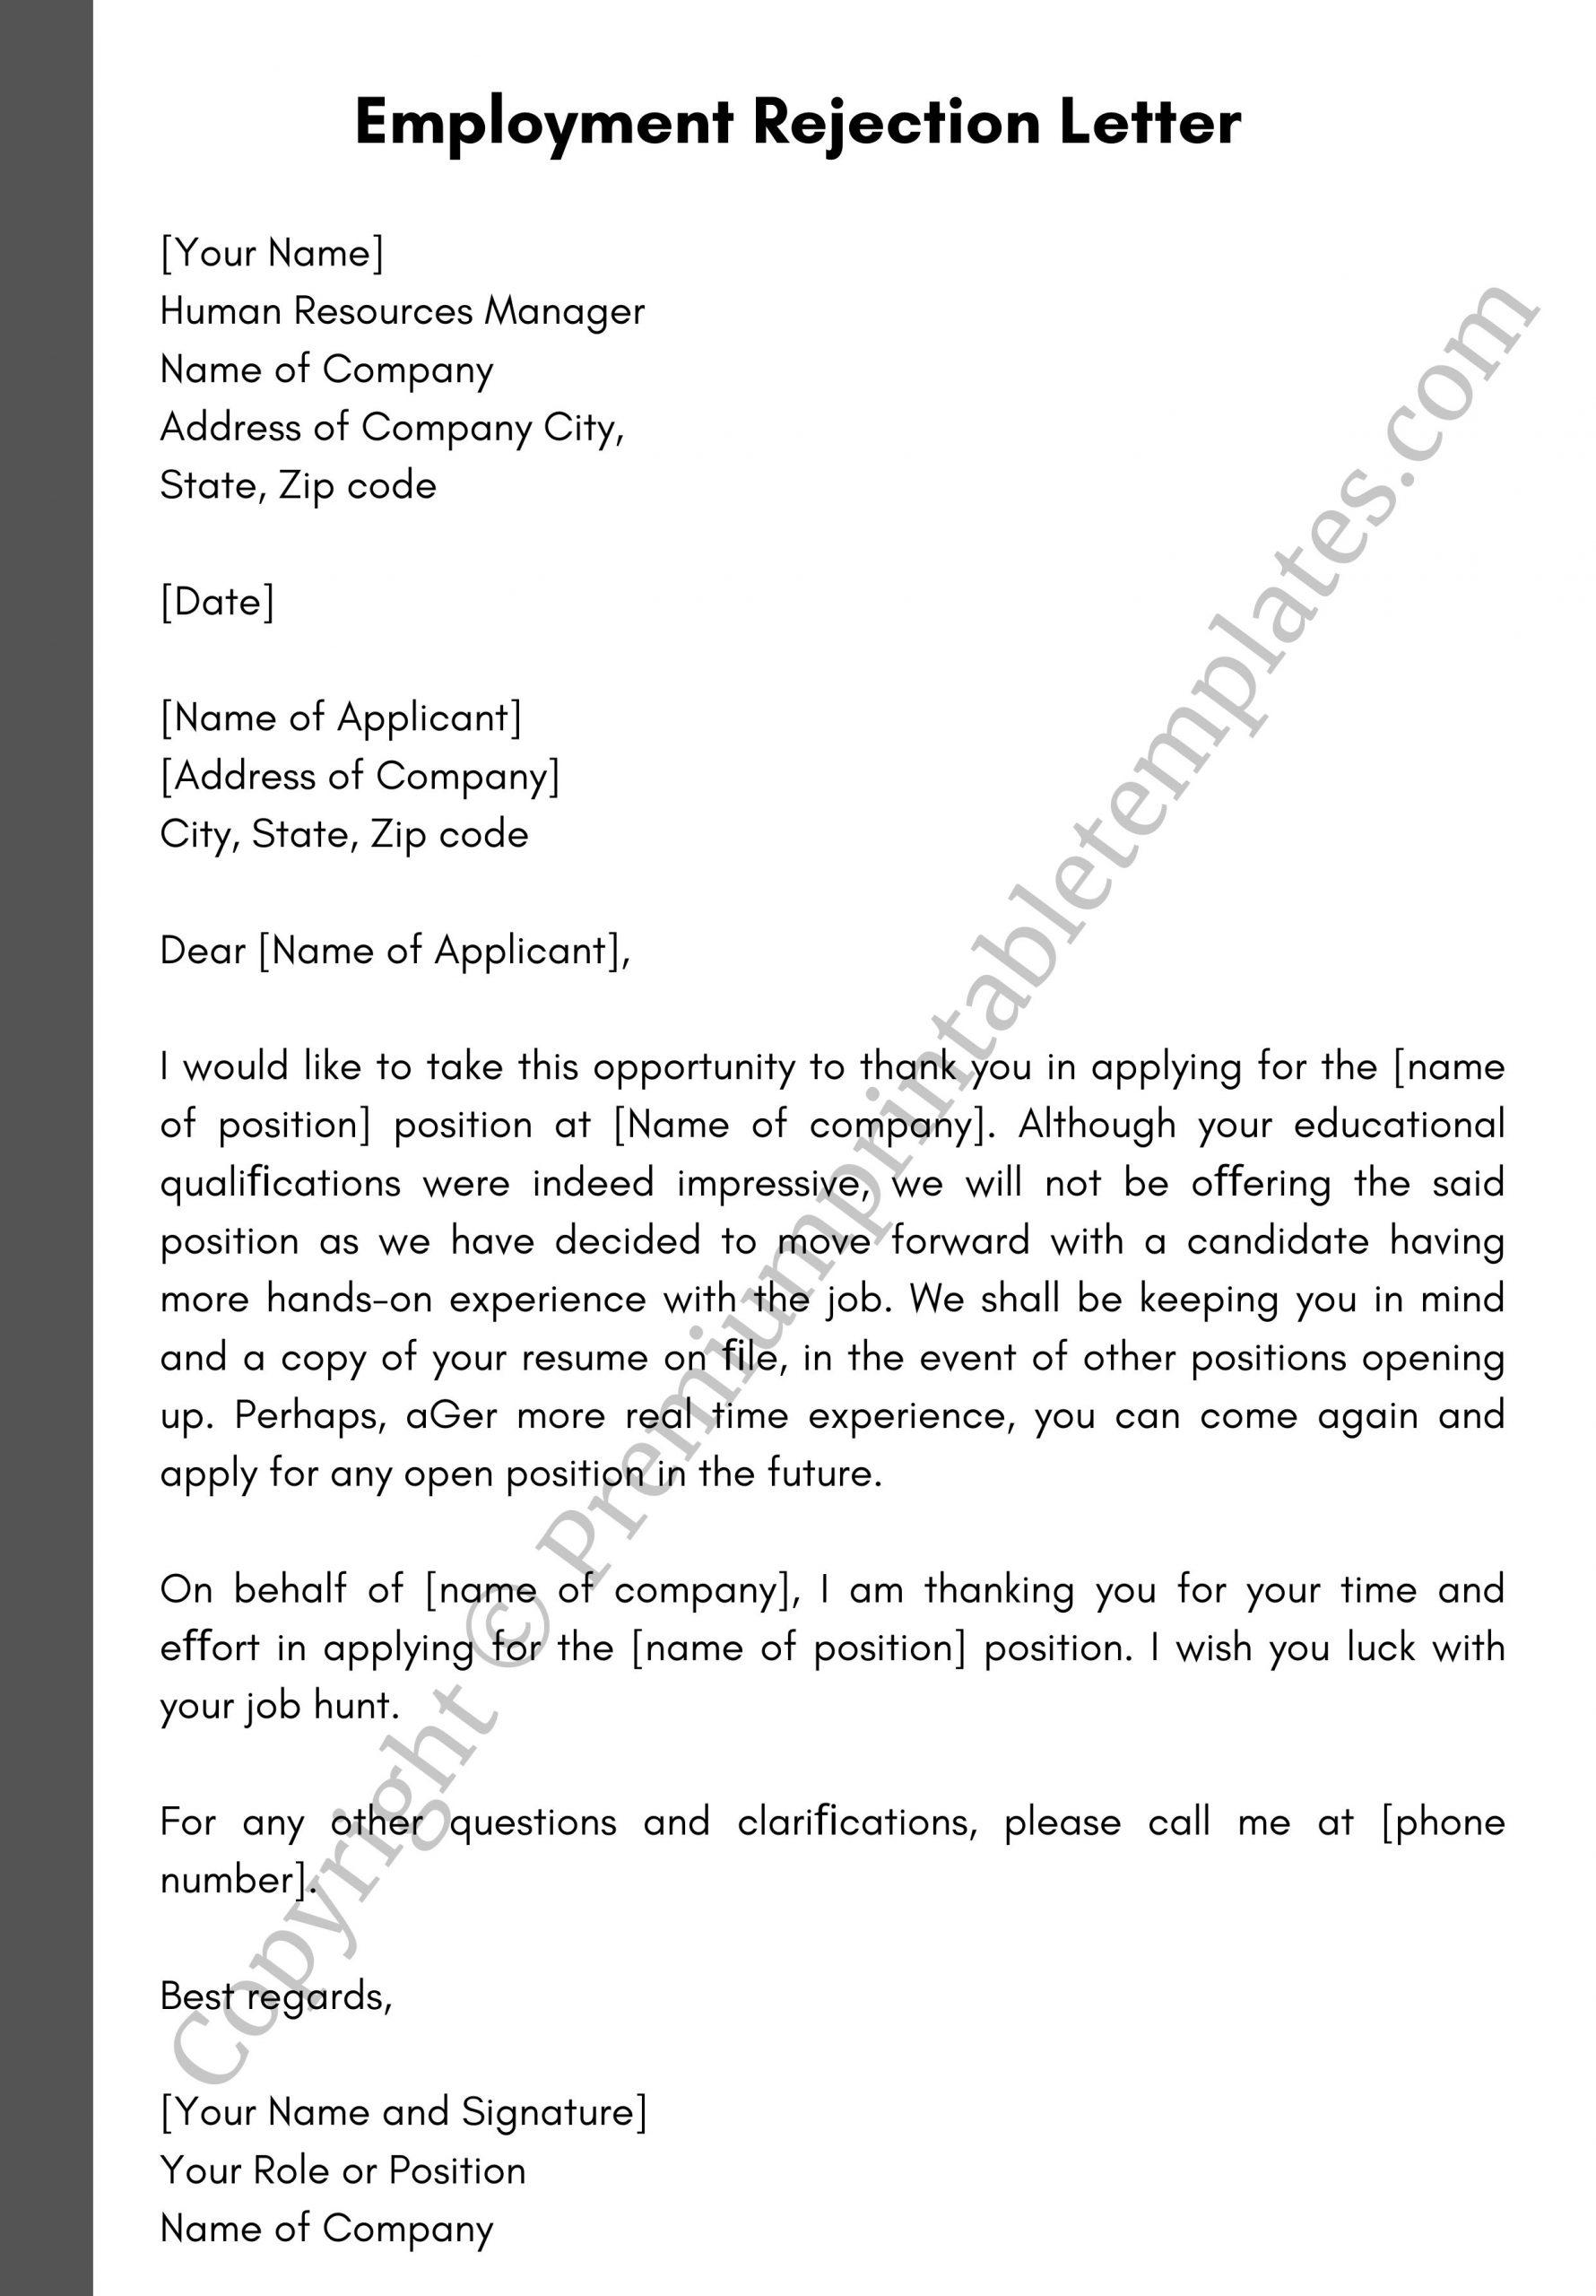 Employment Rejection Letter Editable Pdf Pack Of 5 Premium Printable Templates